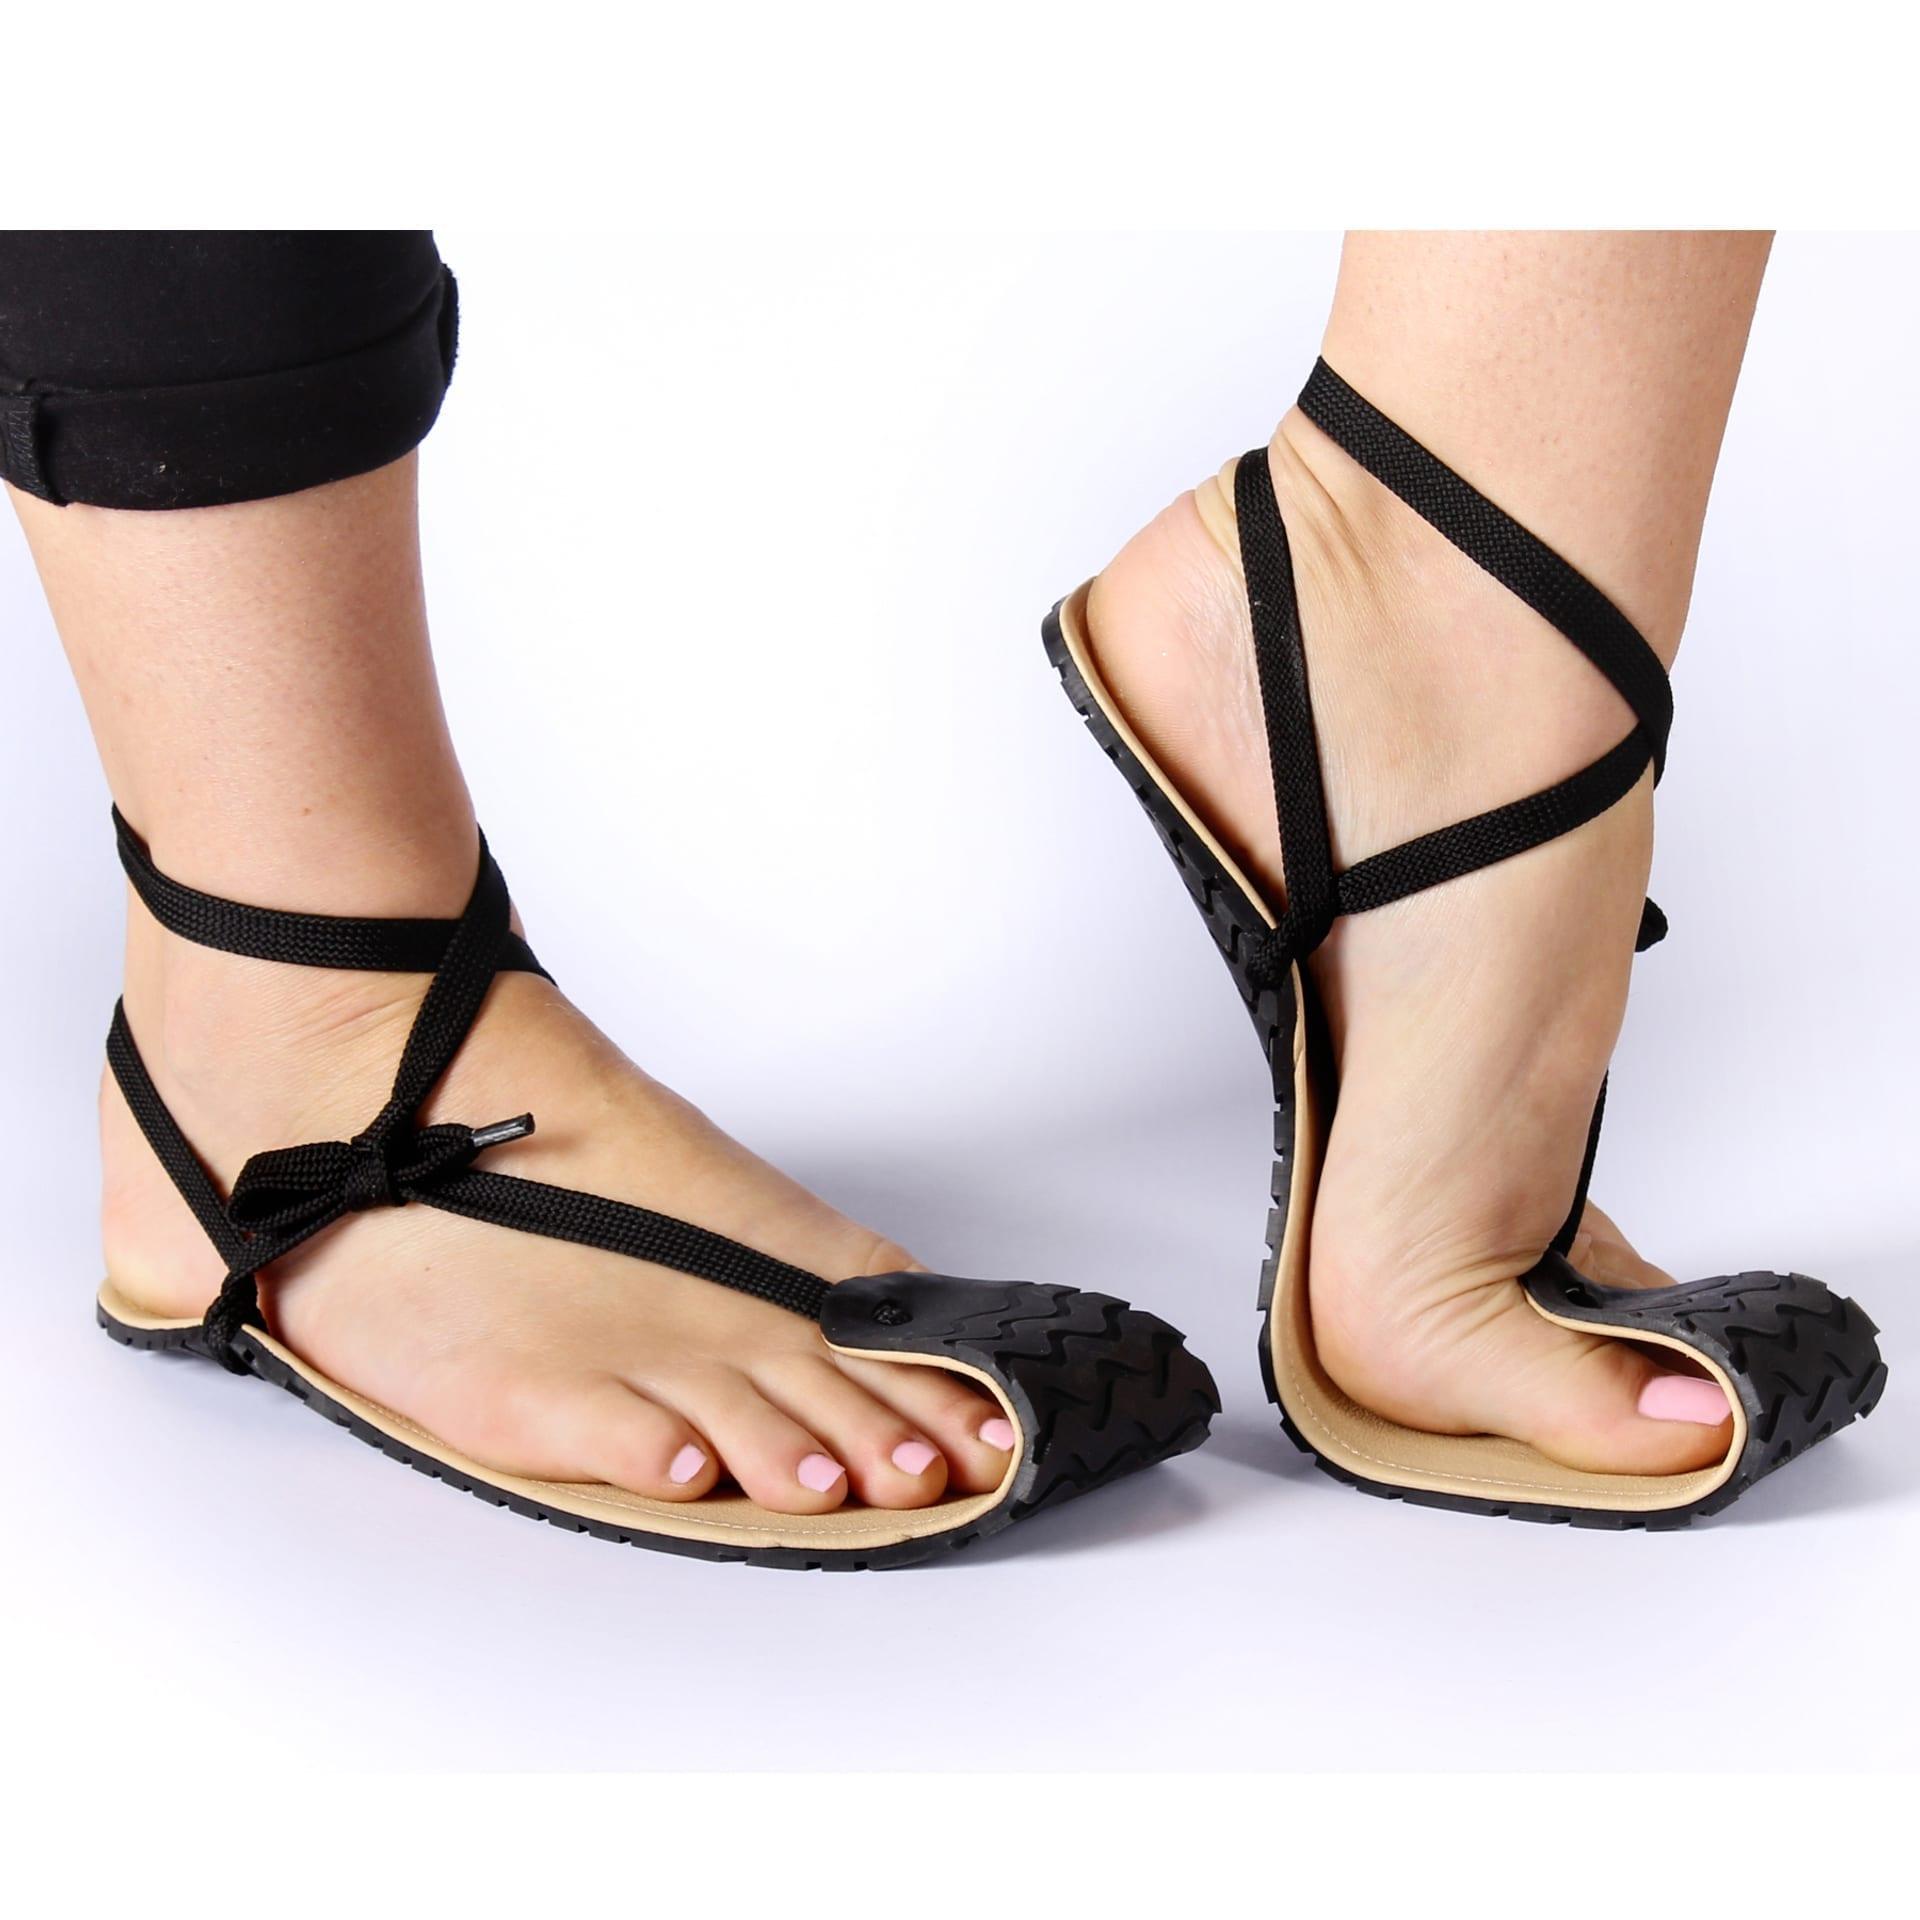 fe1e18fc8b5 tarahumara flip-flops men s sandals barefoot born to run